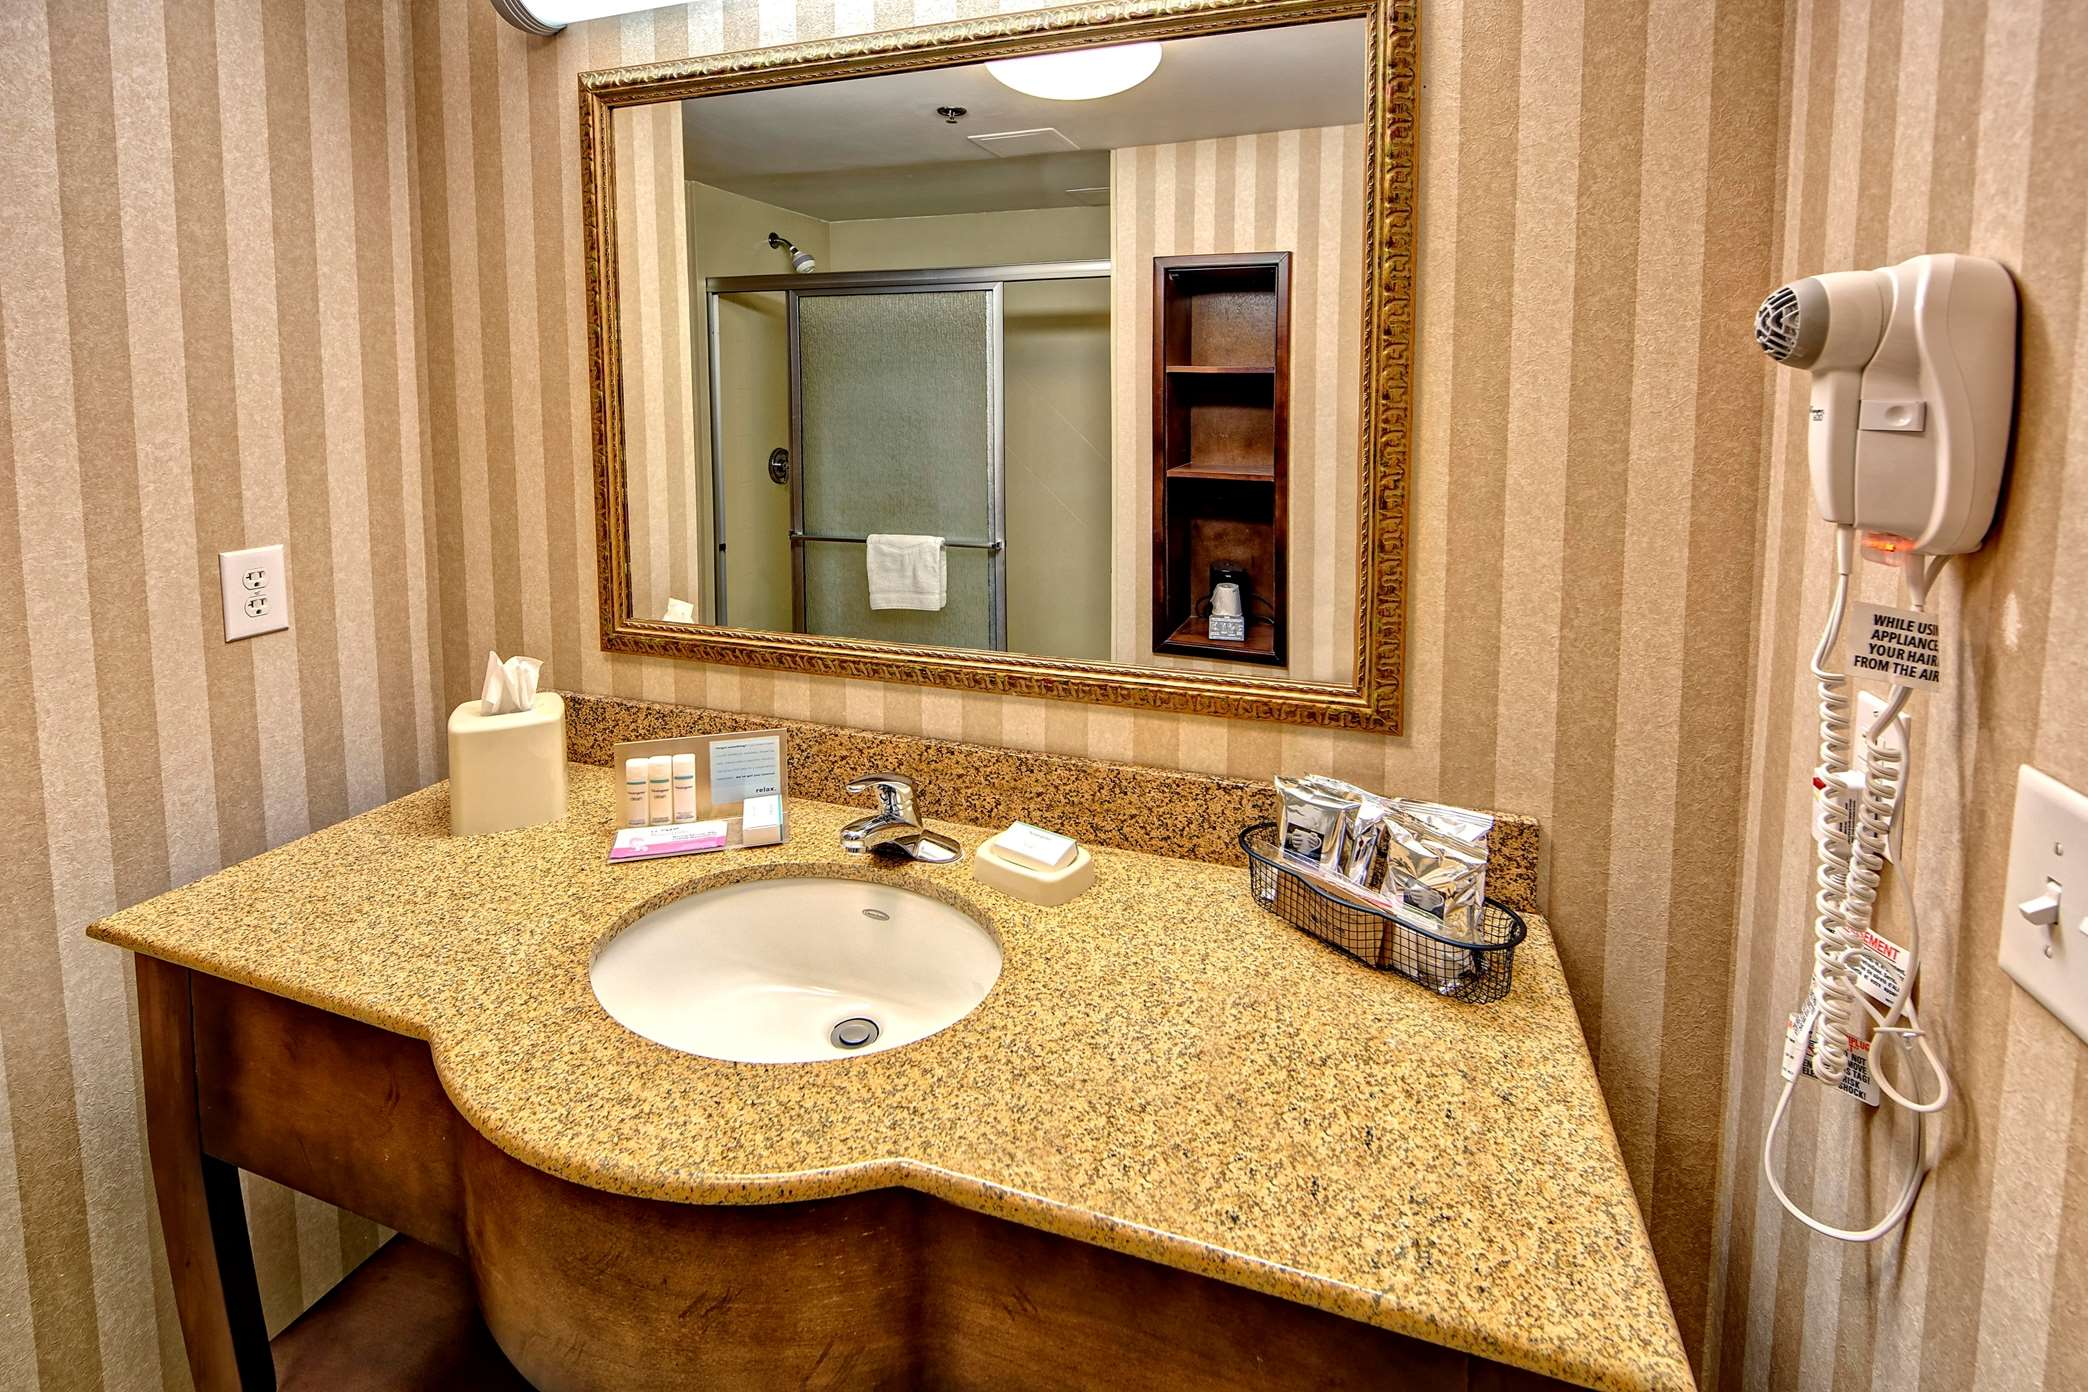 Hampton Inn & Suites Cashiers-Sapphire Valley image 25